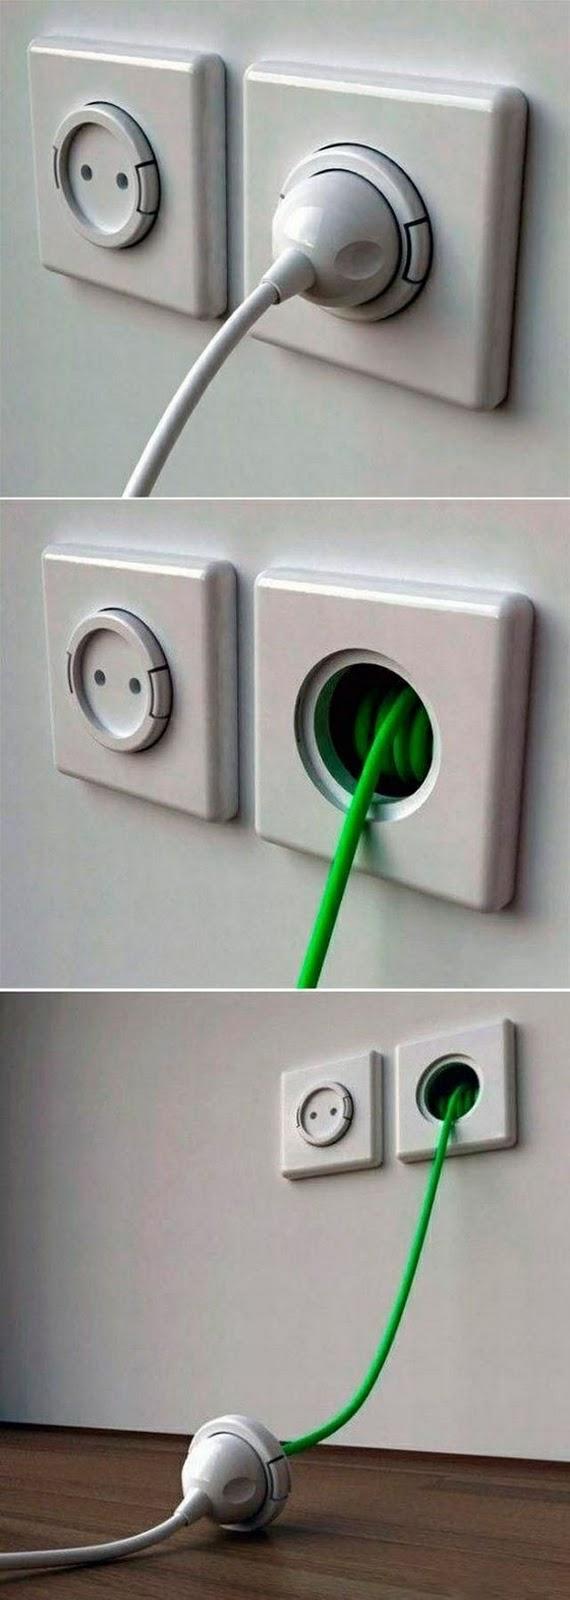 peralatan rumah yang kreatif